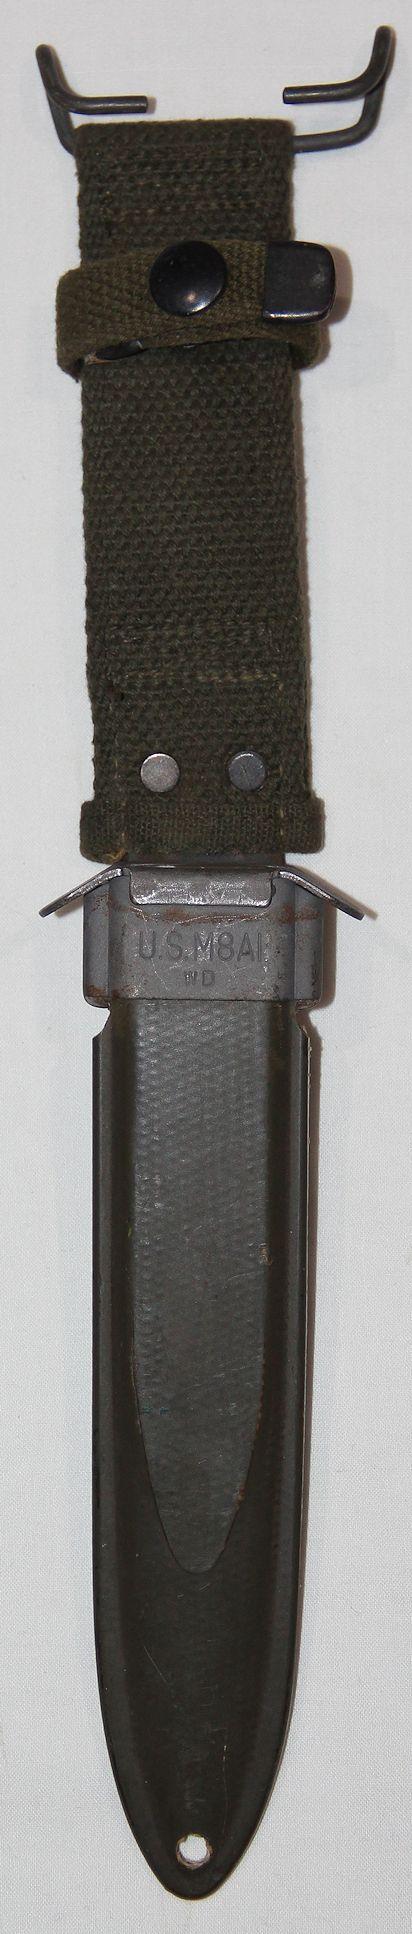 S037. EARLY KOREAN WAR U.S. M8A1 BAYONET OR KNIFE SCABBARD